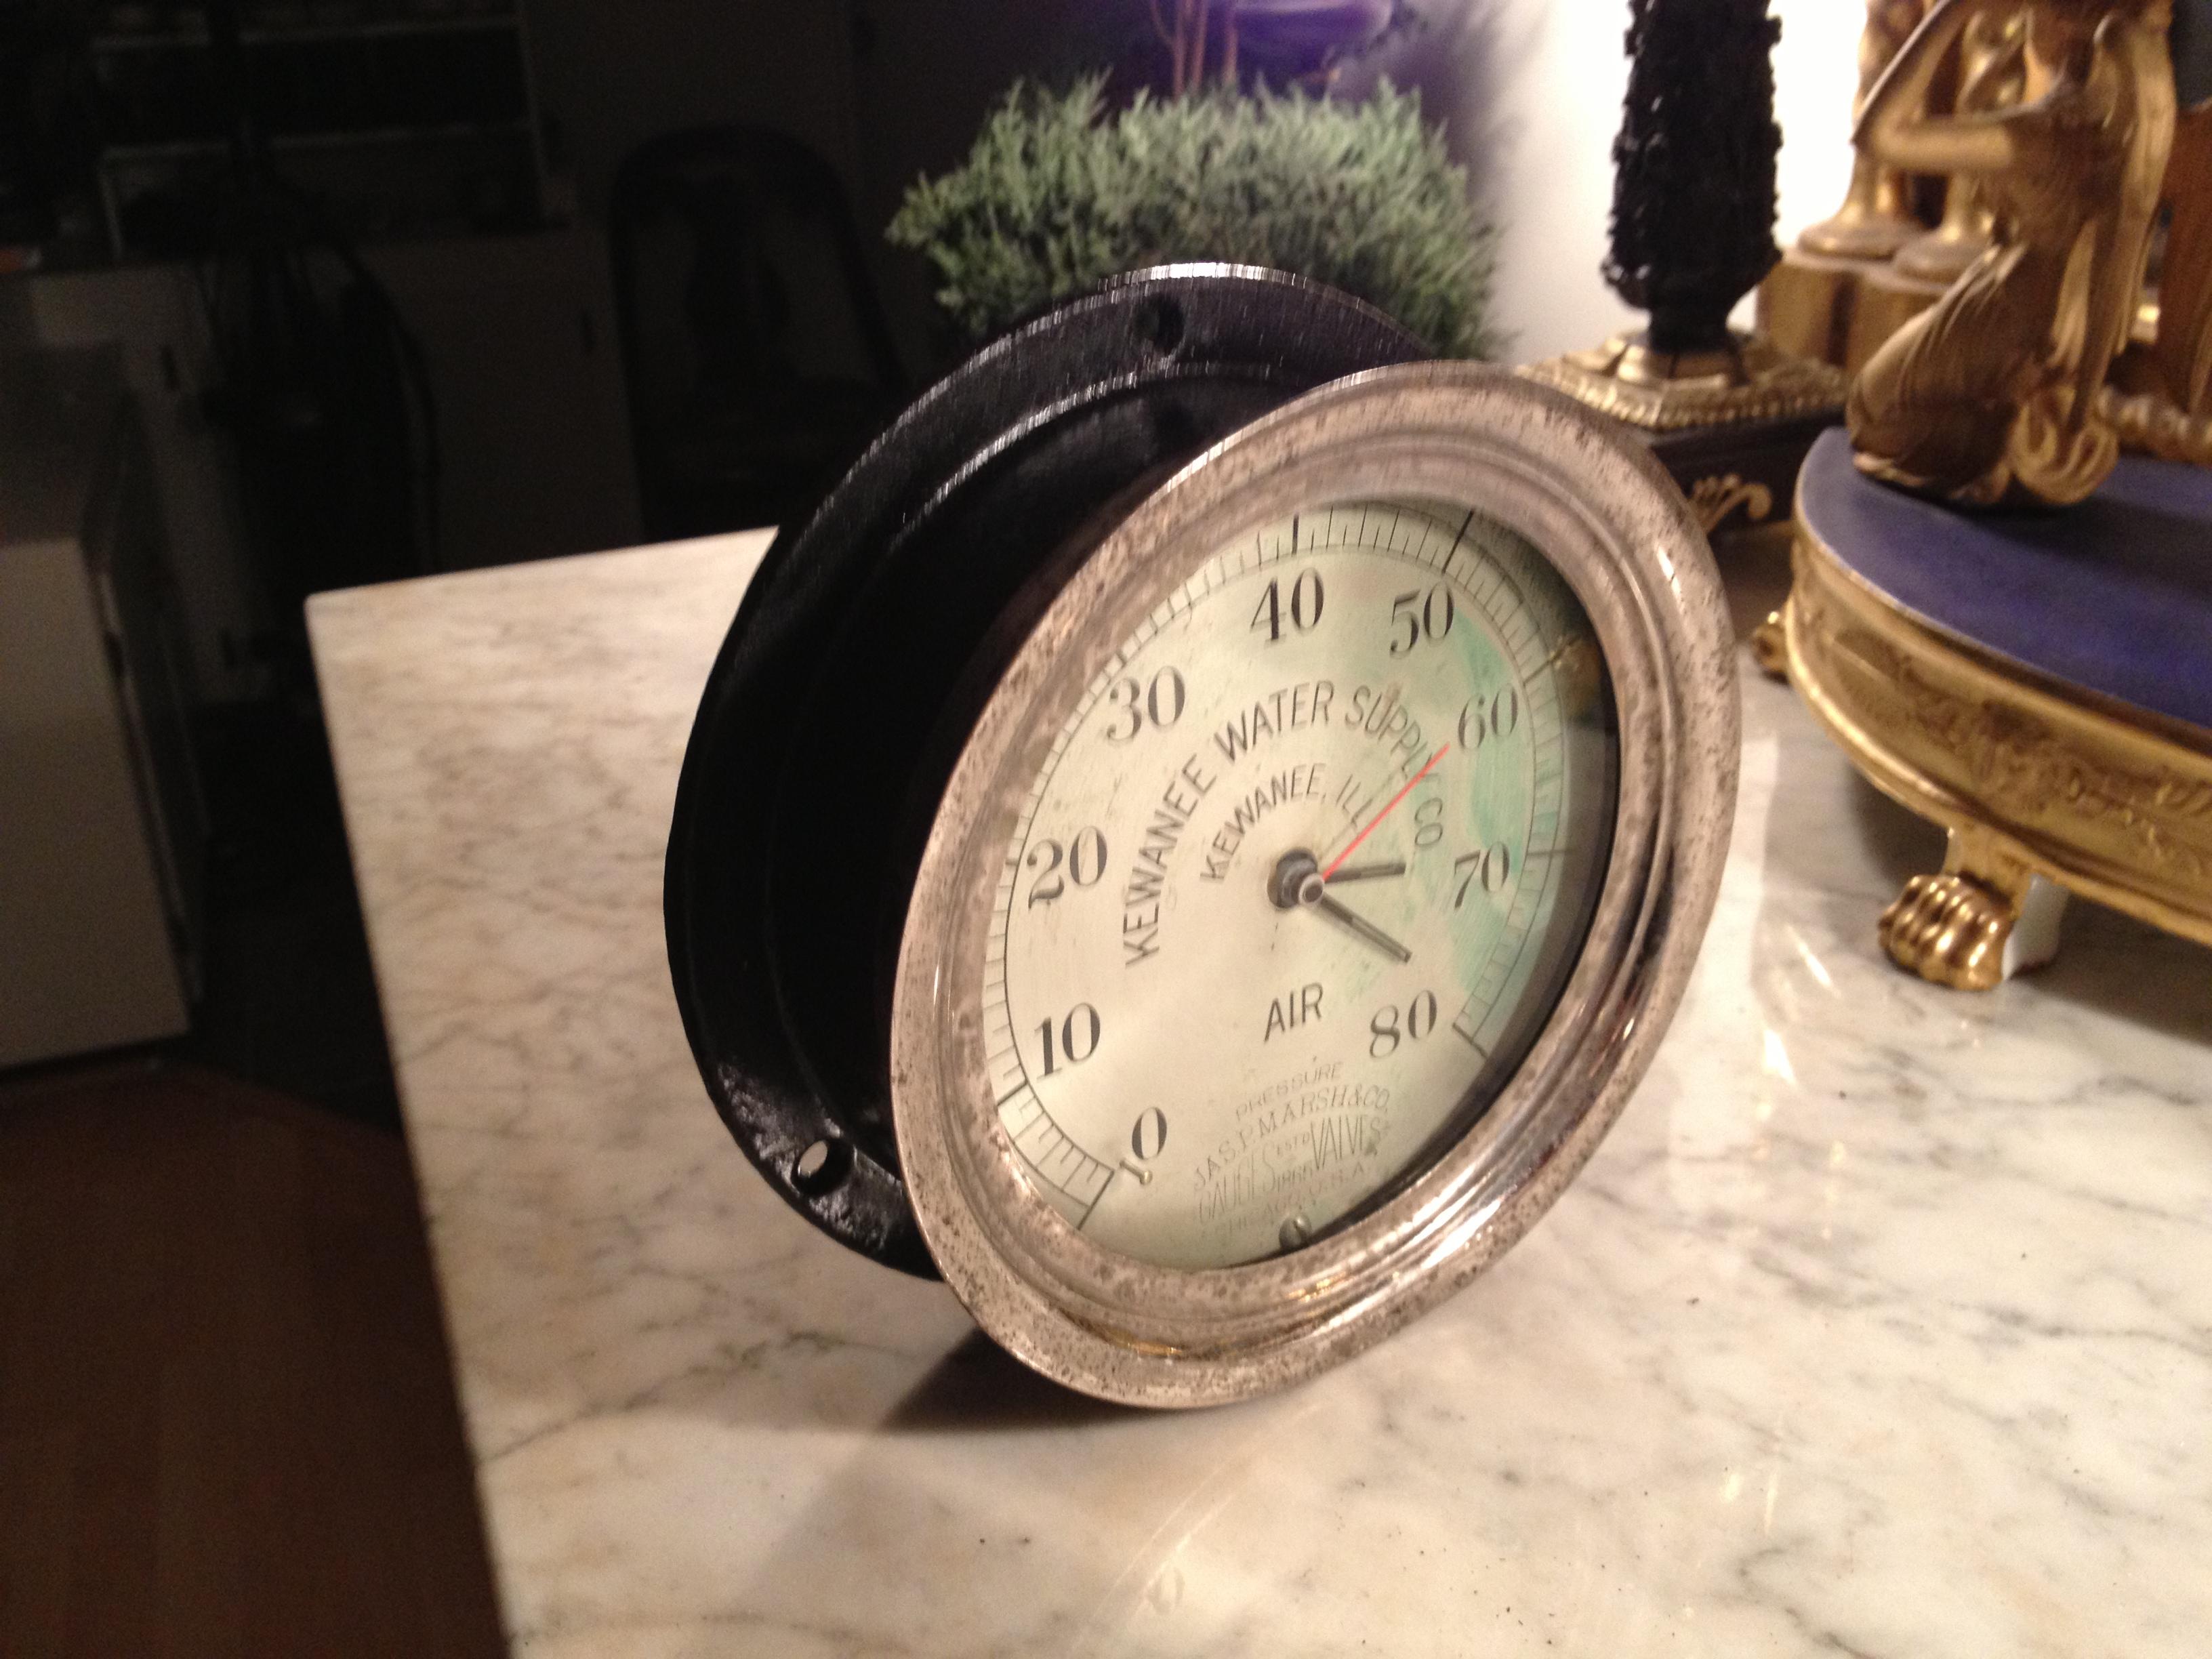 i_gearz_steampunk_hand_made_steam_pressure_gauge_clock_6_battery_op_antique_vintage_clocks_9.JPG